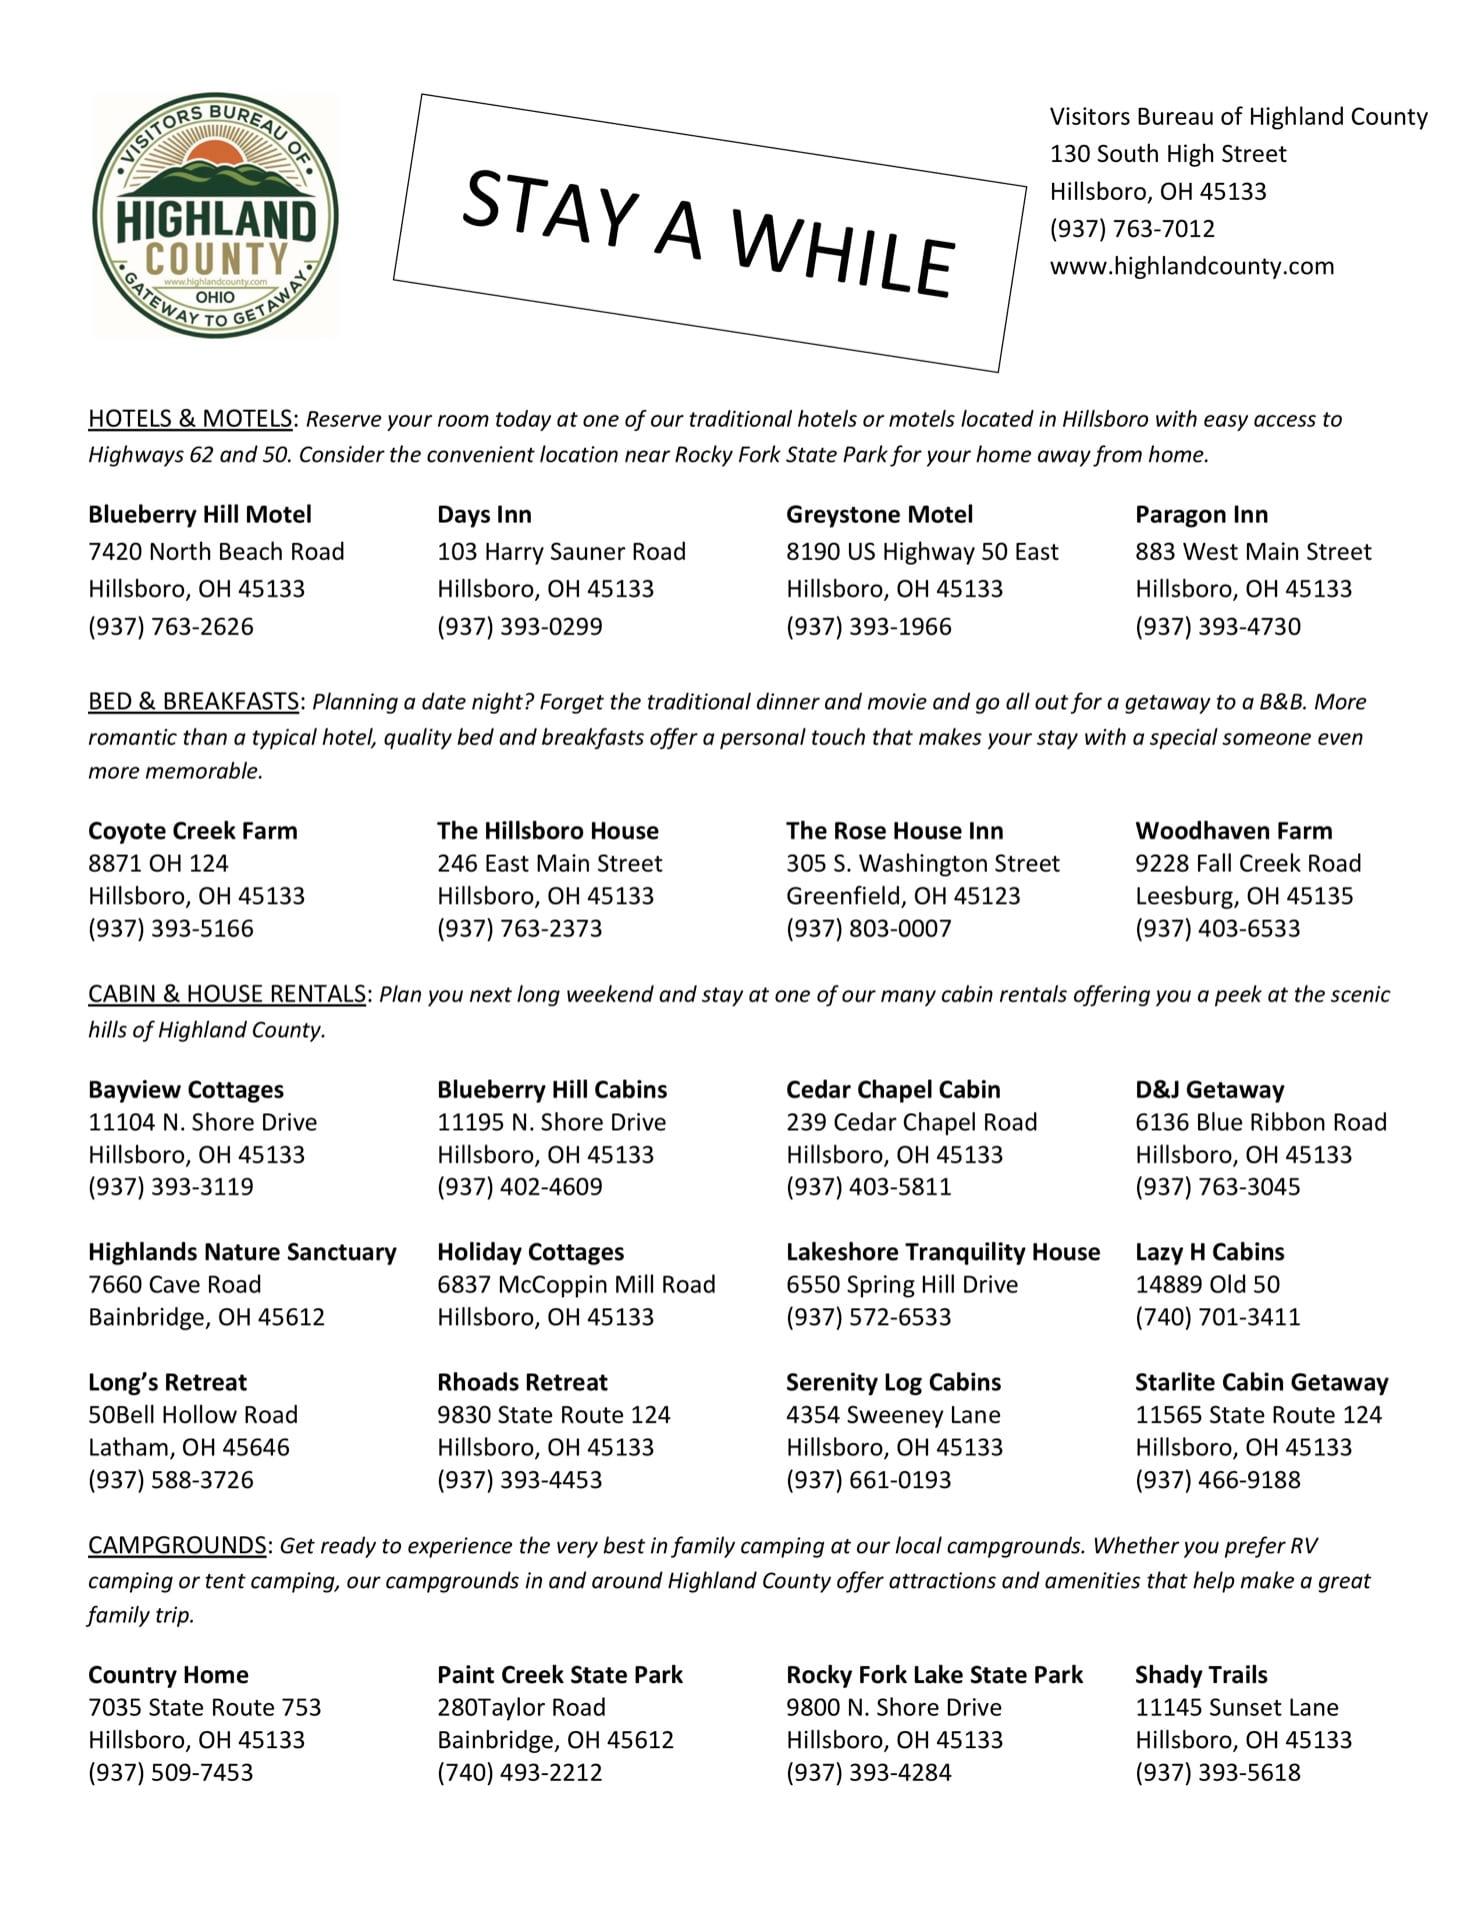 List of Highland County, Ohio lodging establishments